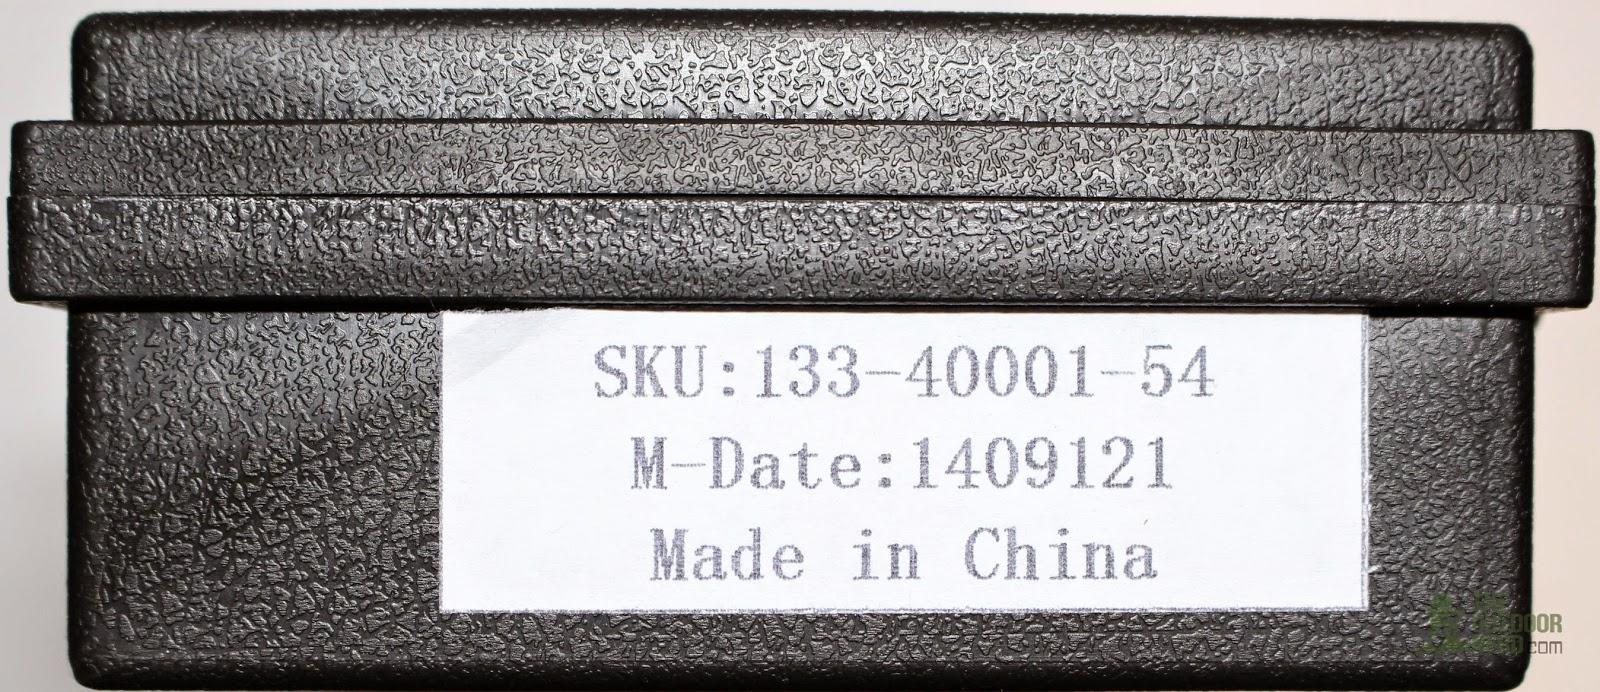 OxyLED MD50 Flashlight Kit - In Box 3